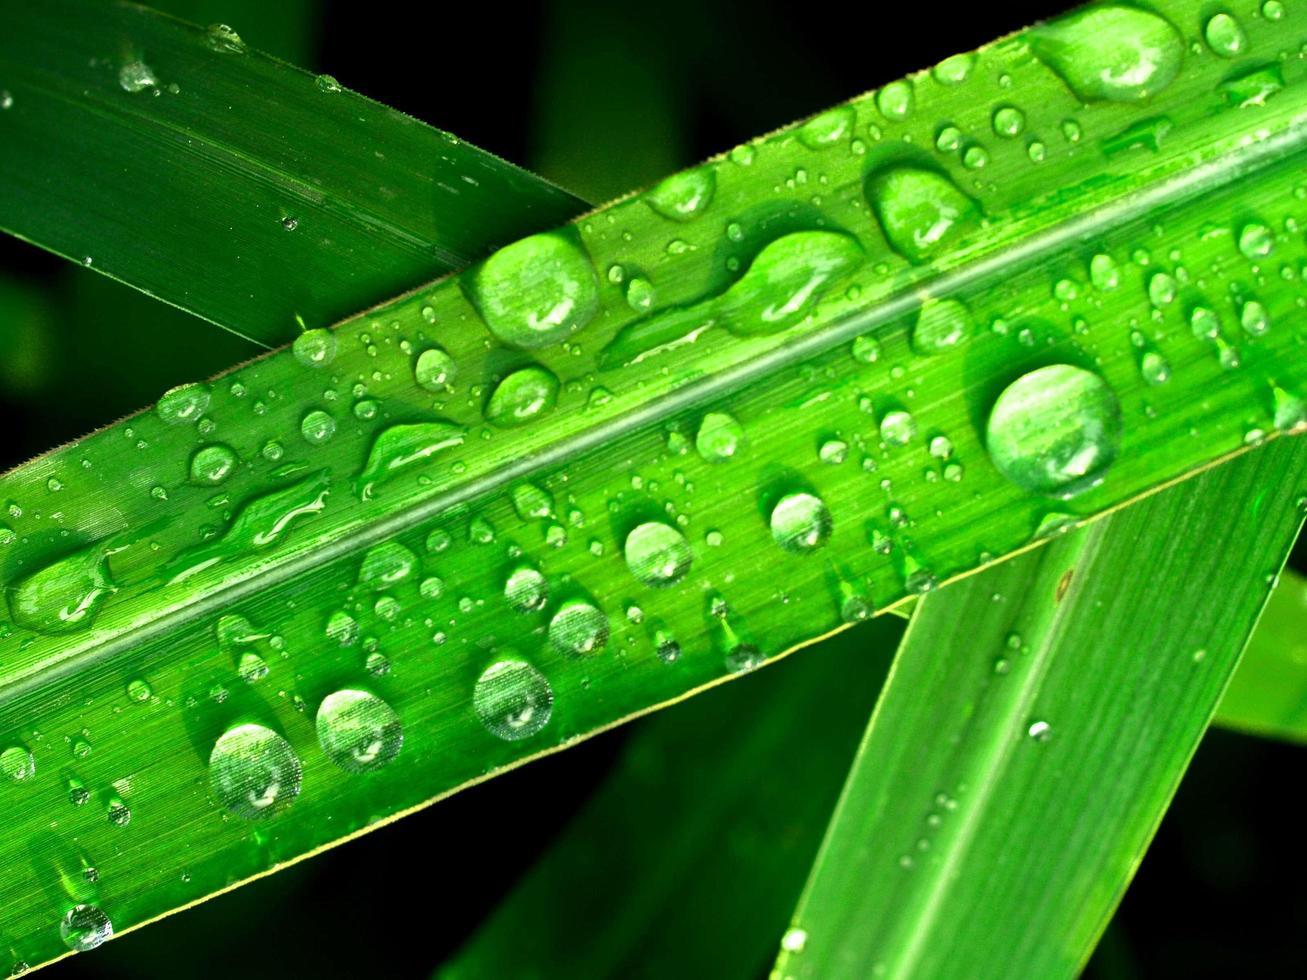 waterdruppels op blad foto